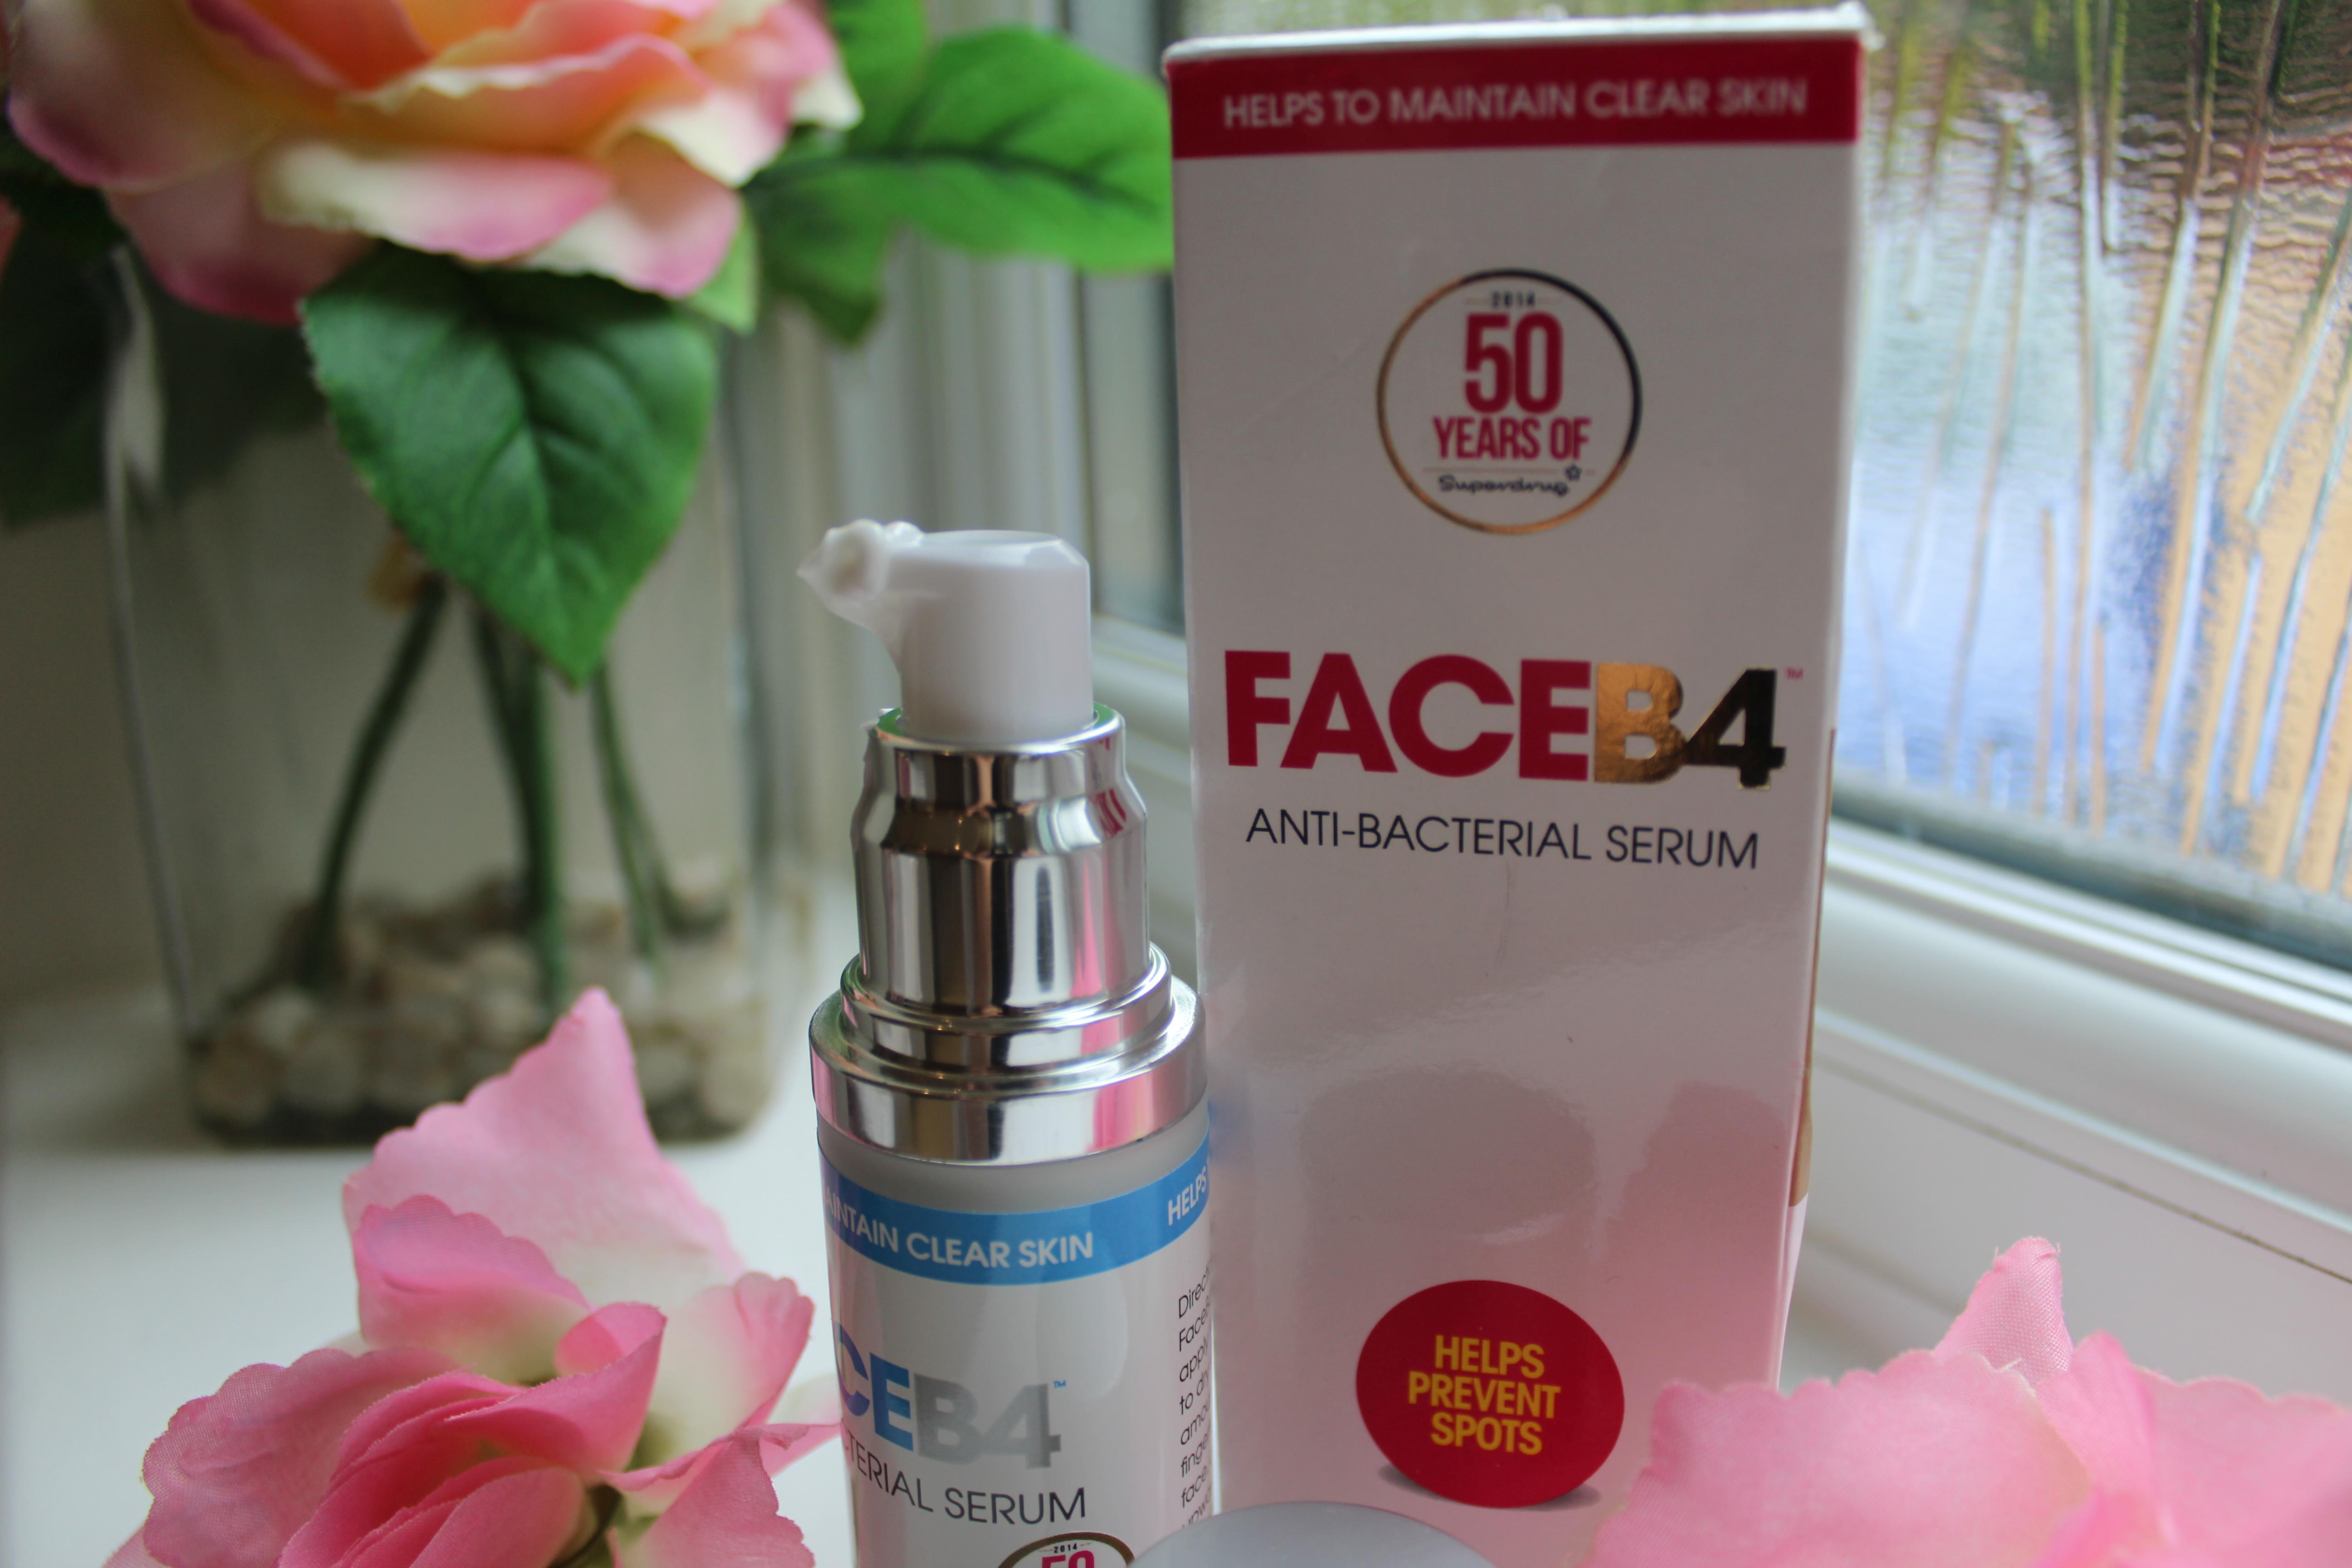 Face B4 Wash & Serum